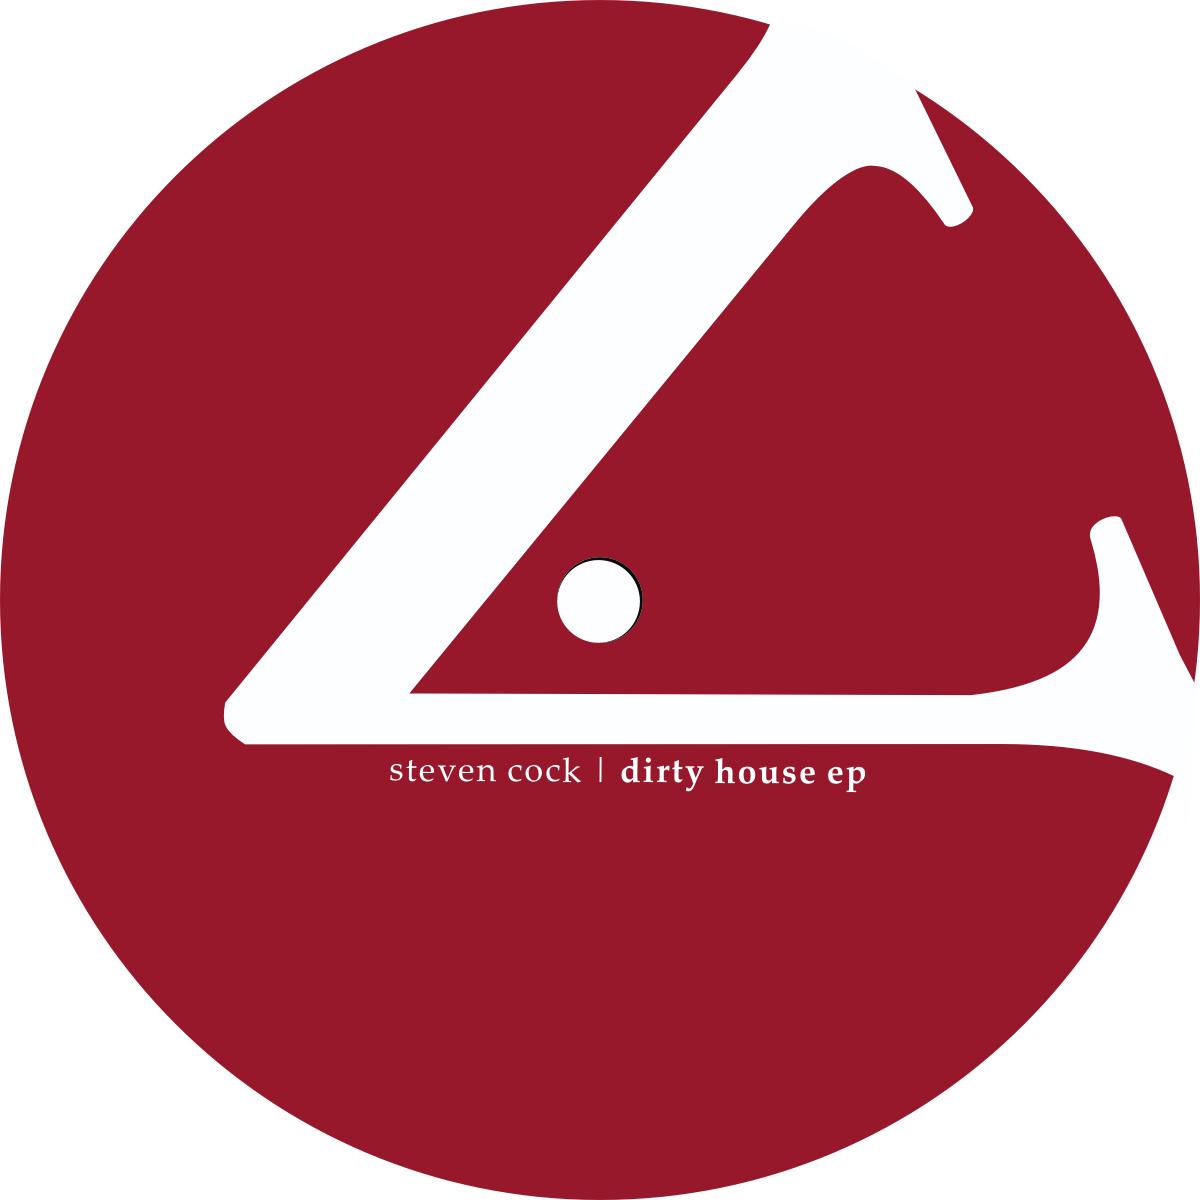 Steven Cock - Dirty House EP